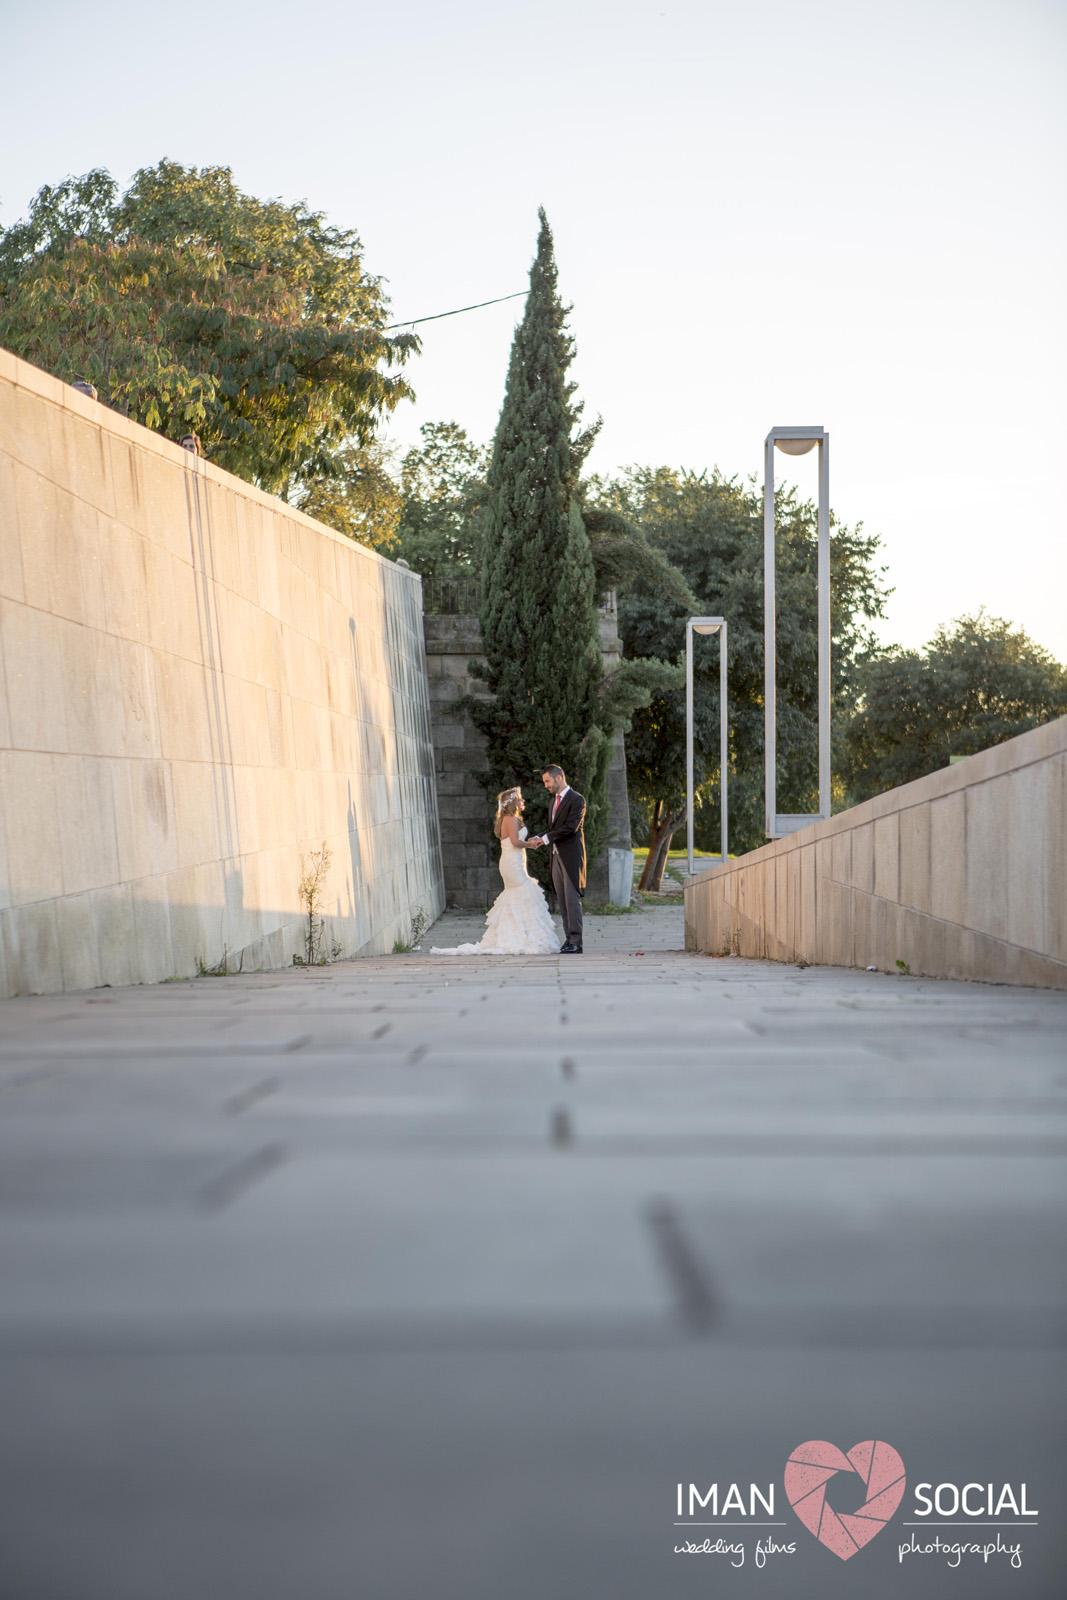 77B0846 Juan Antonio y Mónica - Postboda - video boda cordoba